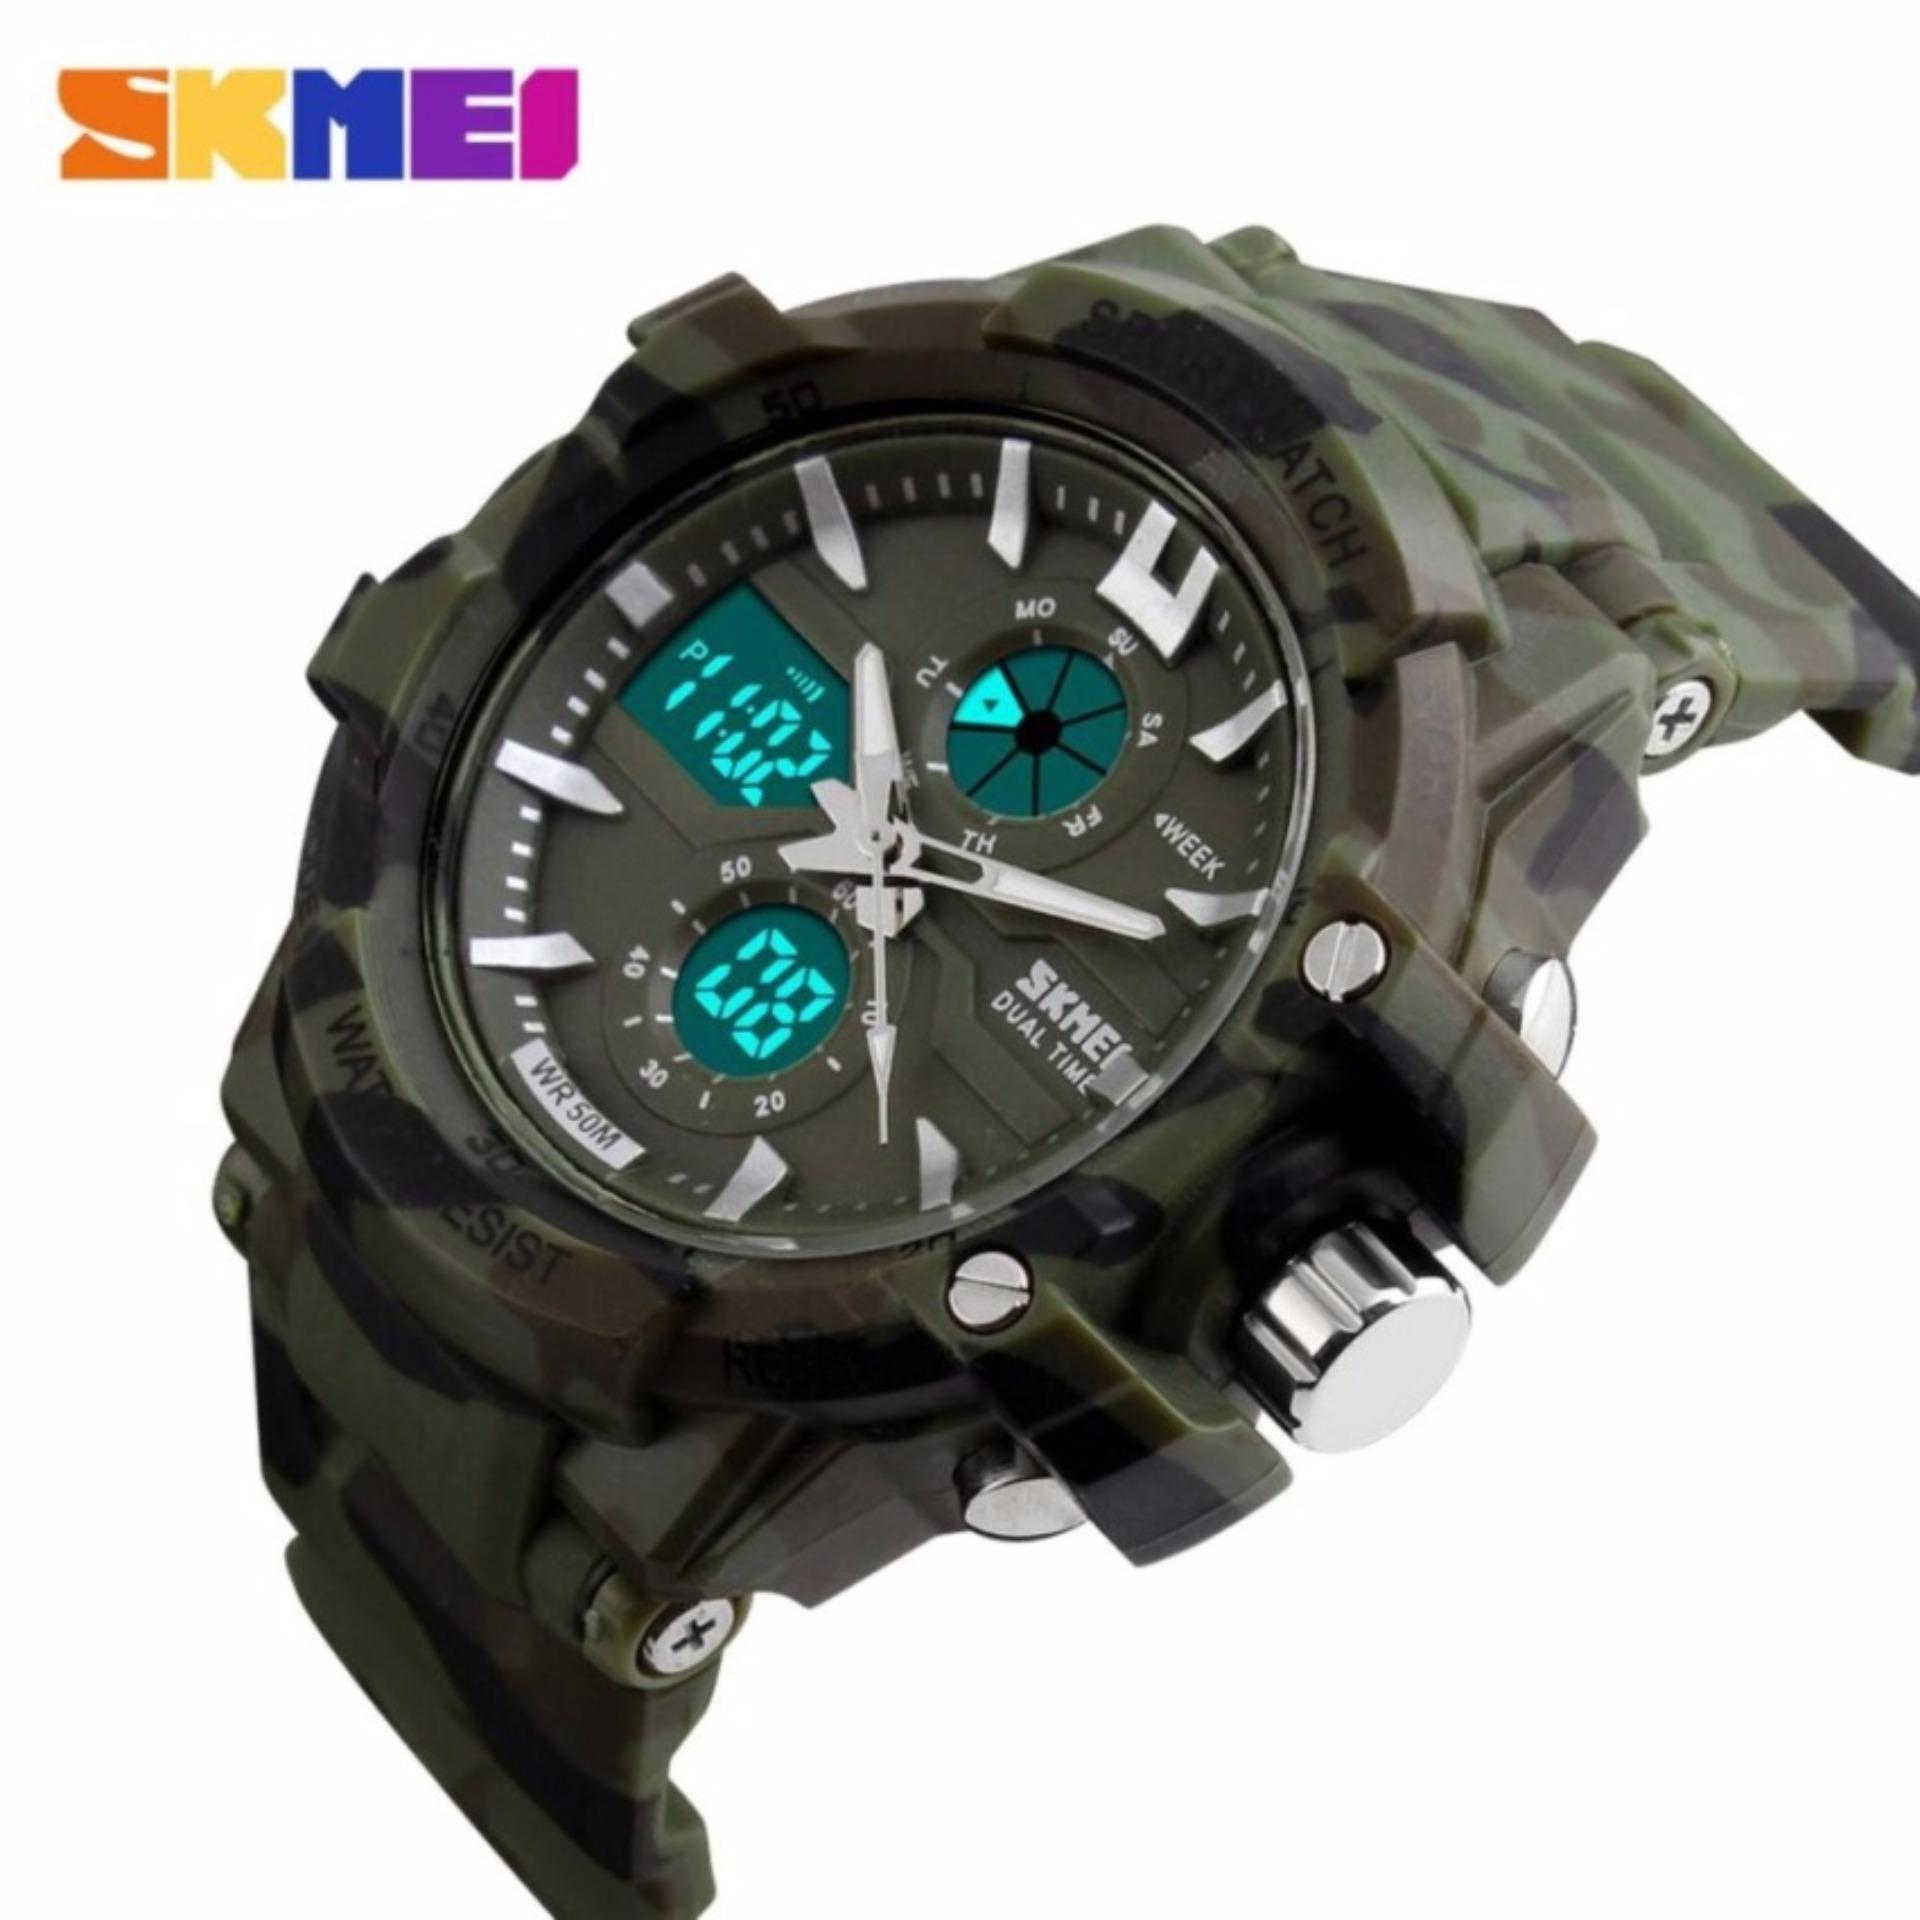 Skmei Men Sport Analog Dual Time Led Watch Water Resistant Wr 50m Ad1202 Jam Tangan Pria Digital Cowok Casio Baby G Shock Fortuner 1202 Anti Air Ad0990